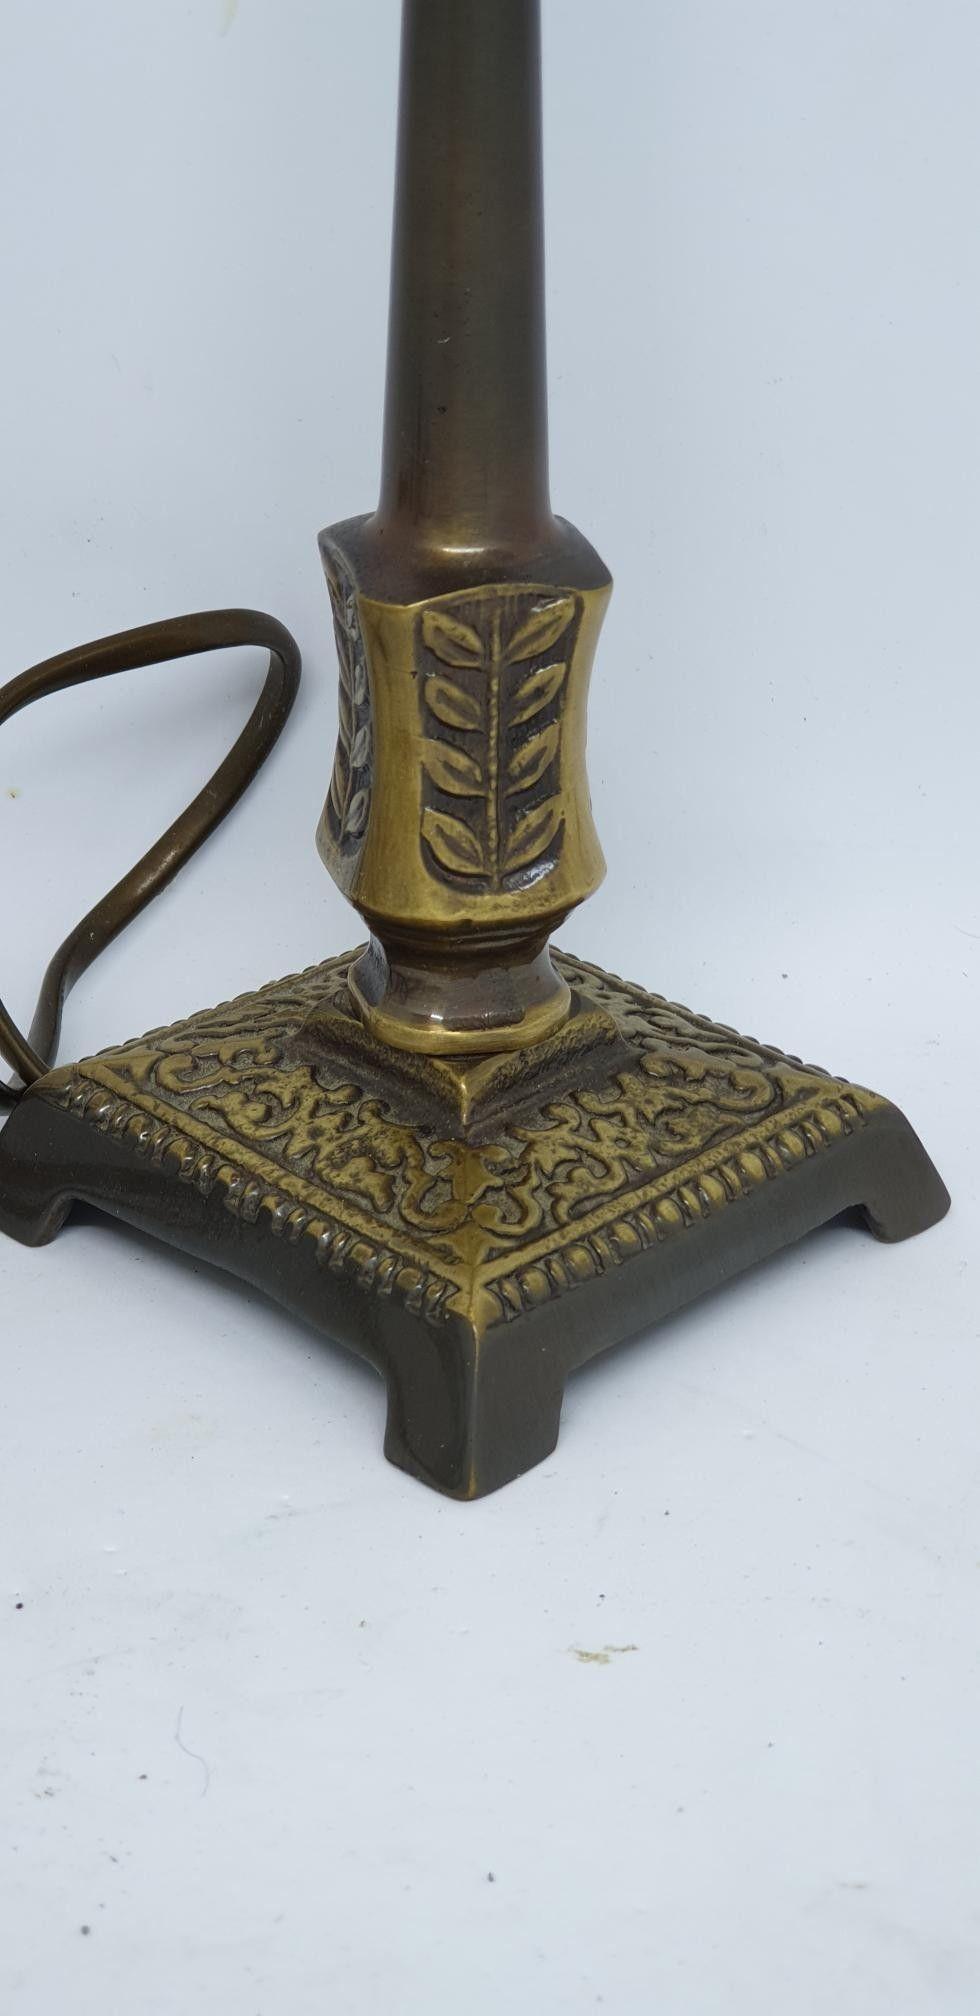 VINTAGE MESSING LAMPE FRA KURANT NORGE | FINN.no